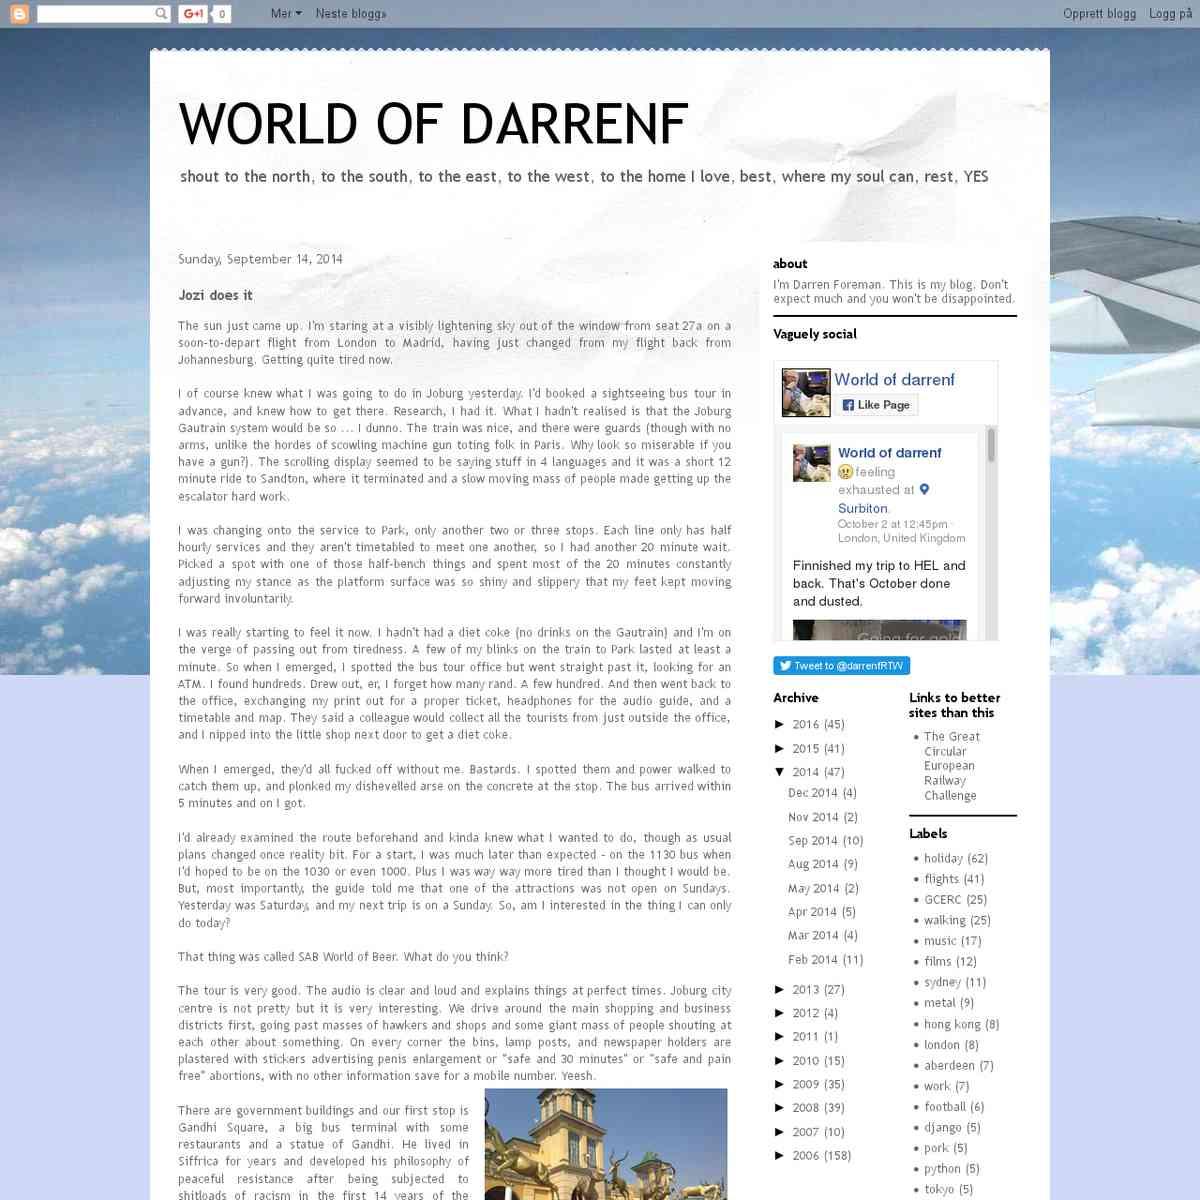 blog.darrenf.org/2014/09/jozi-does-it.html